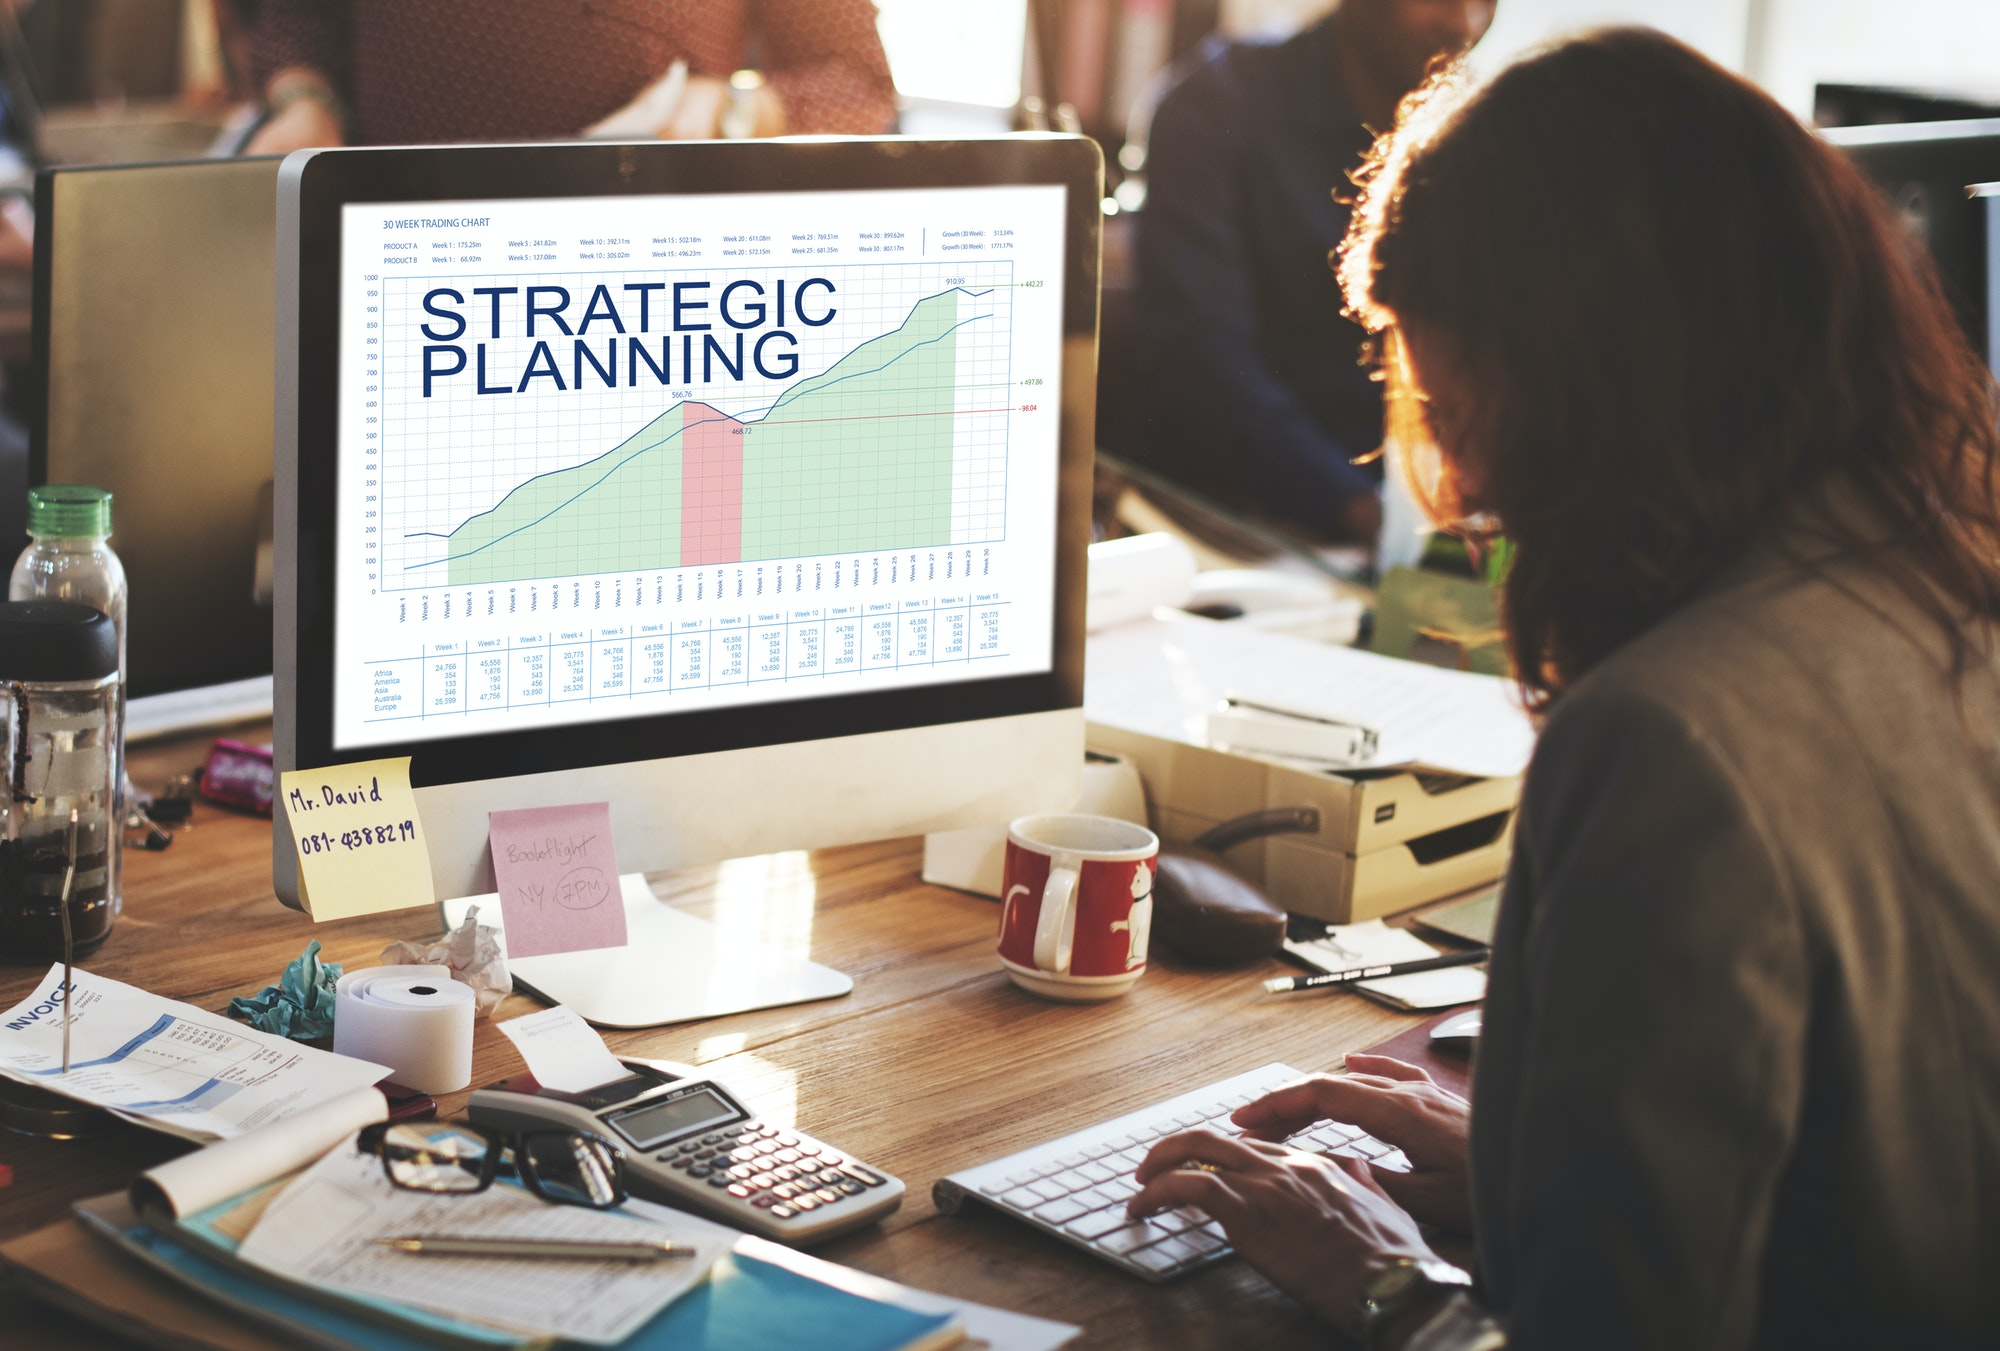 Strategic Plan Graphs Business Marketing Goals concept